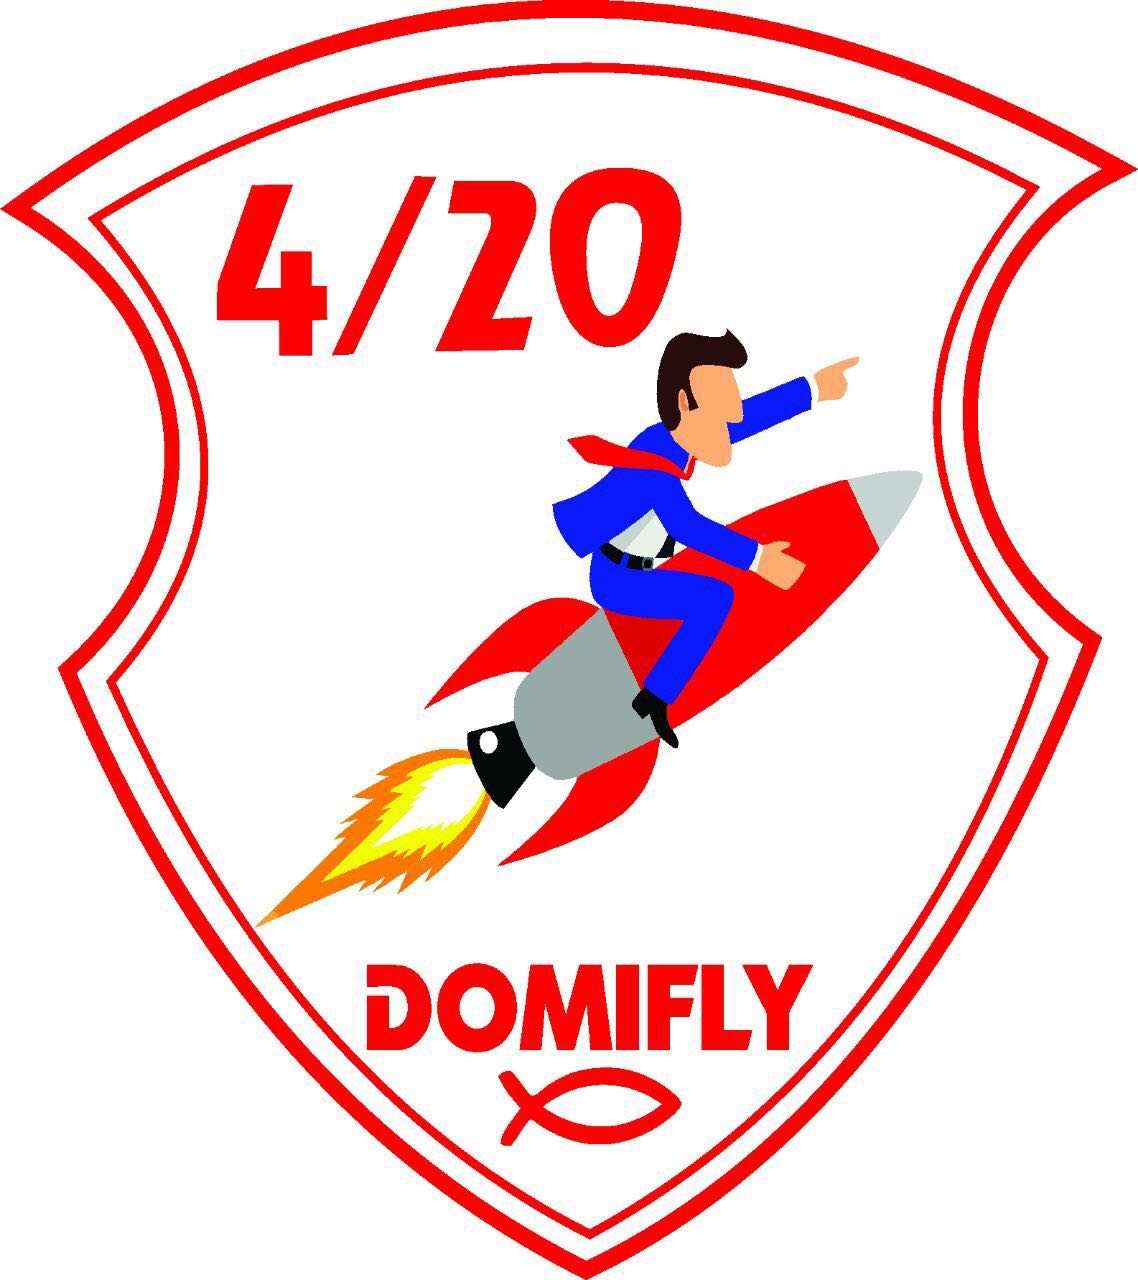 DOMIFLY S.A.S